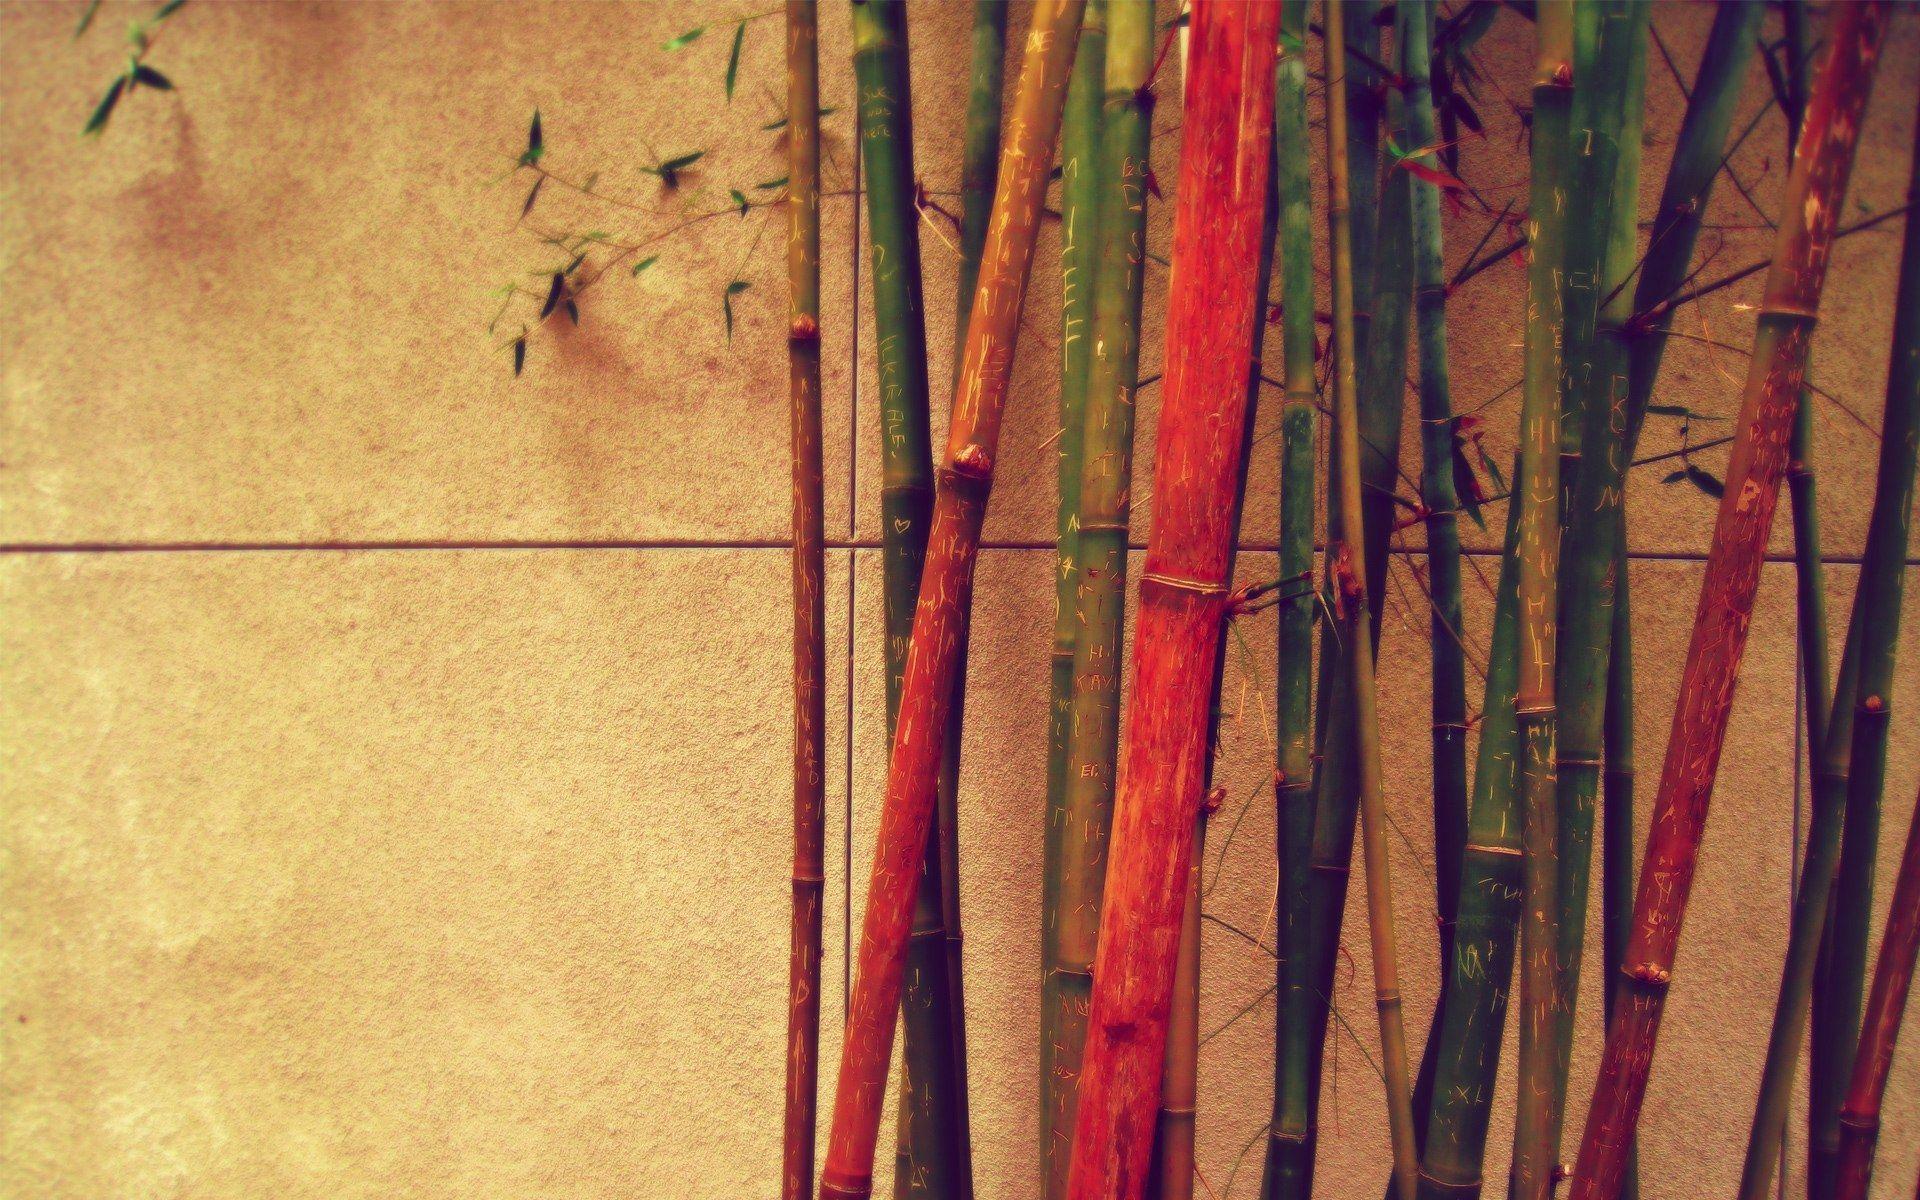 Bamboo Trees Vintage Hd Desktop Wallpaper Background Download Papeles Tapizas De Epoca Wallpapers Vintage Ideas De Fondos De Pantalla